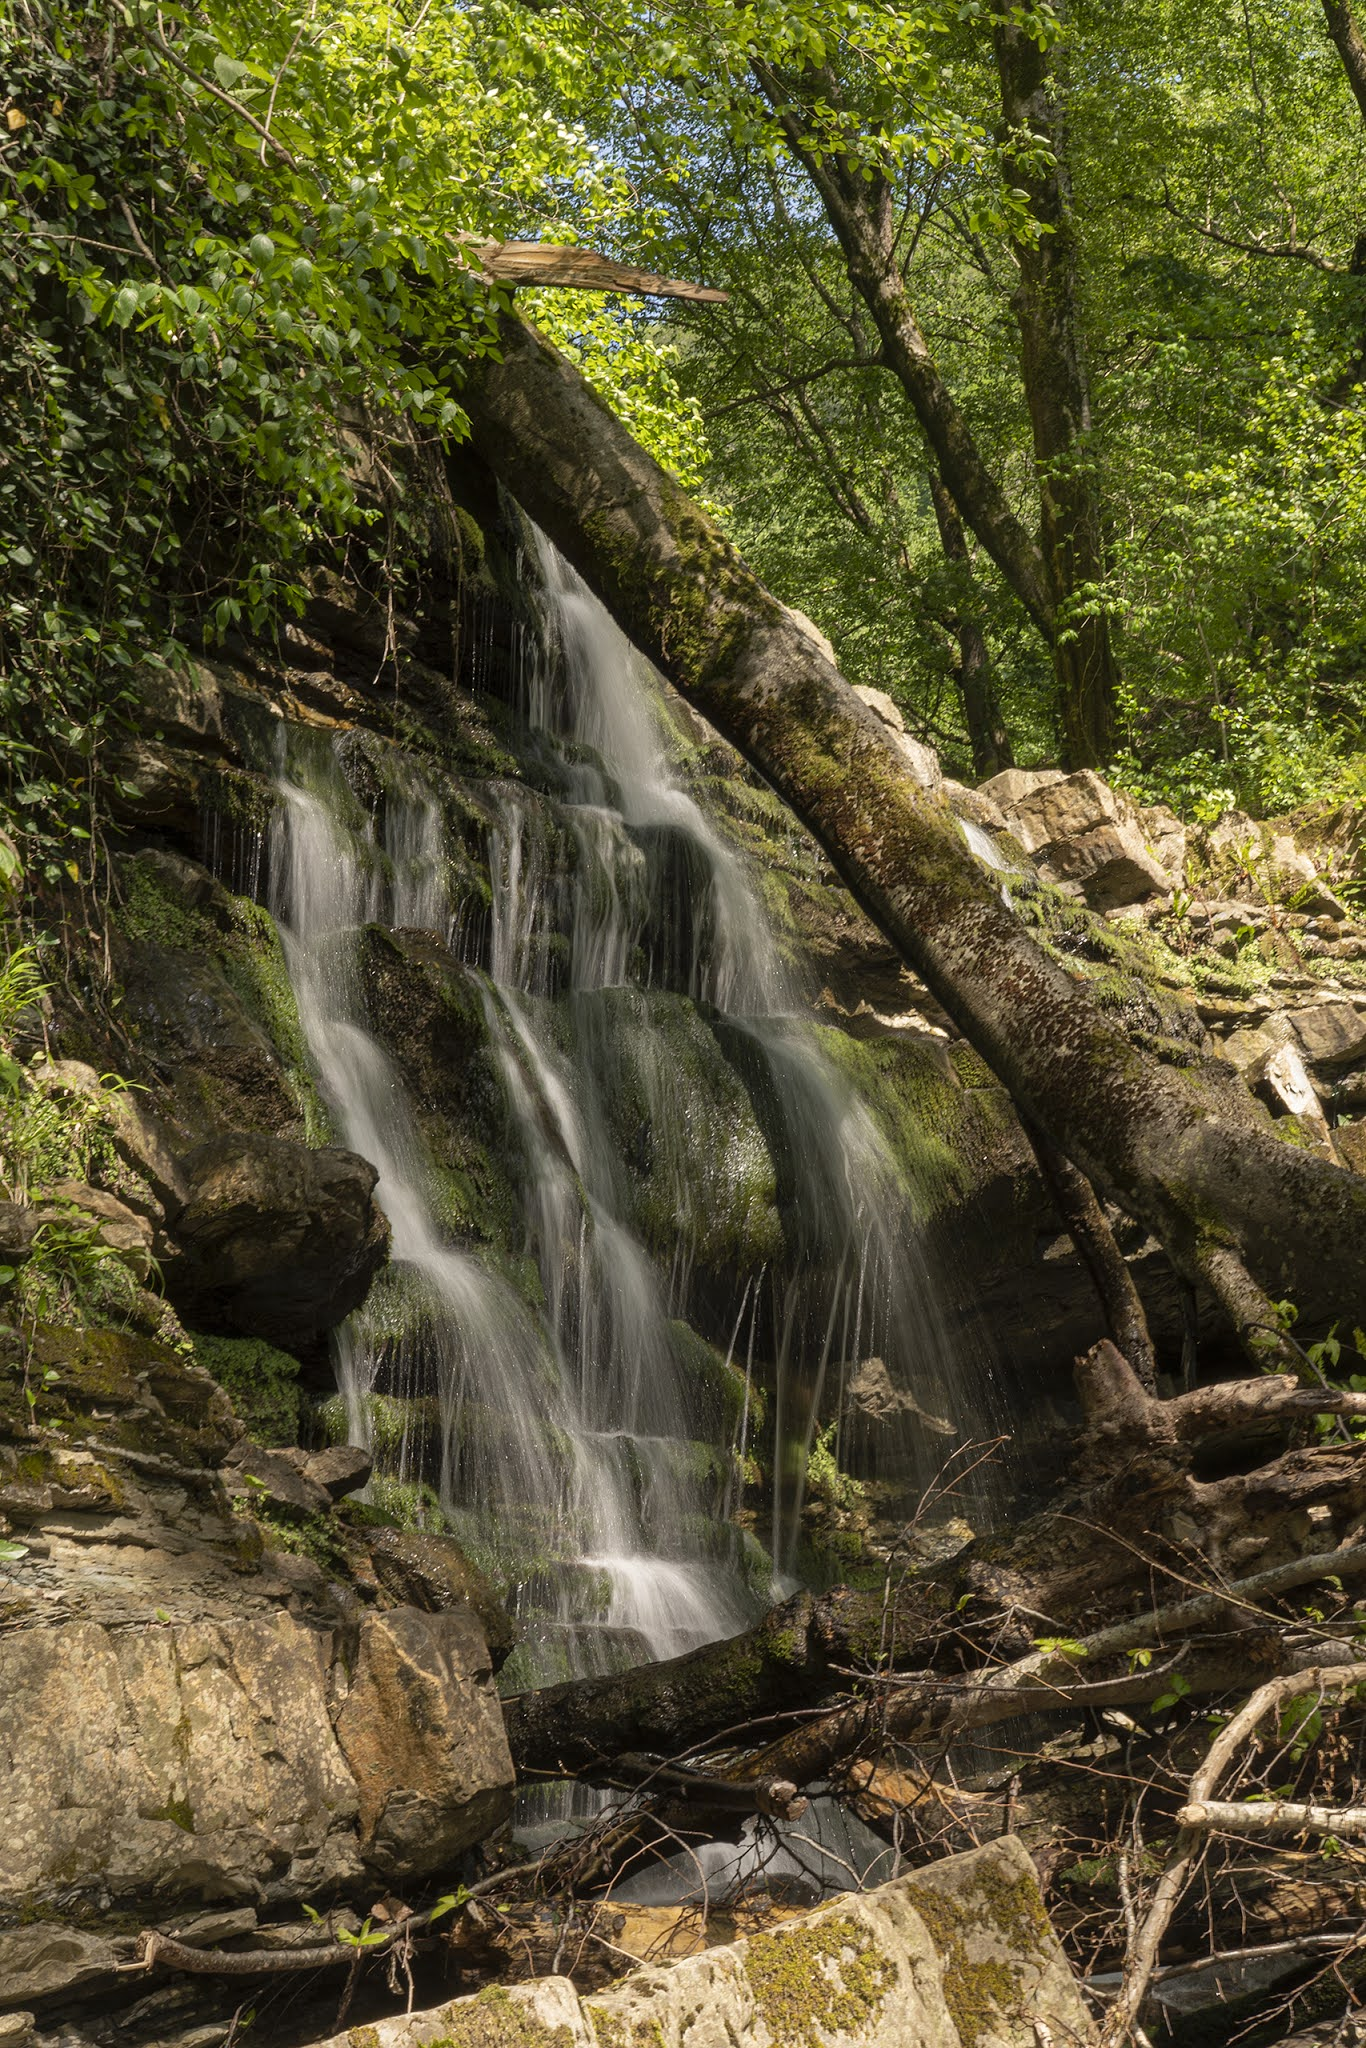 waterfall river forest Sochi Dagomys south nature photo Igor Novik